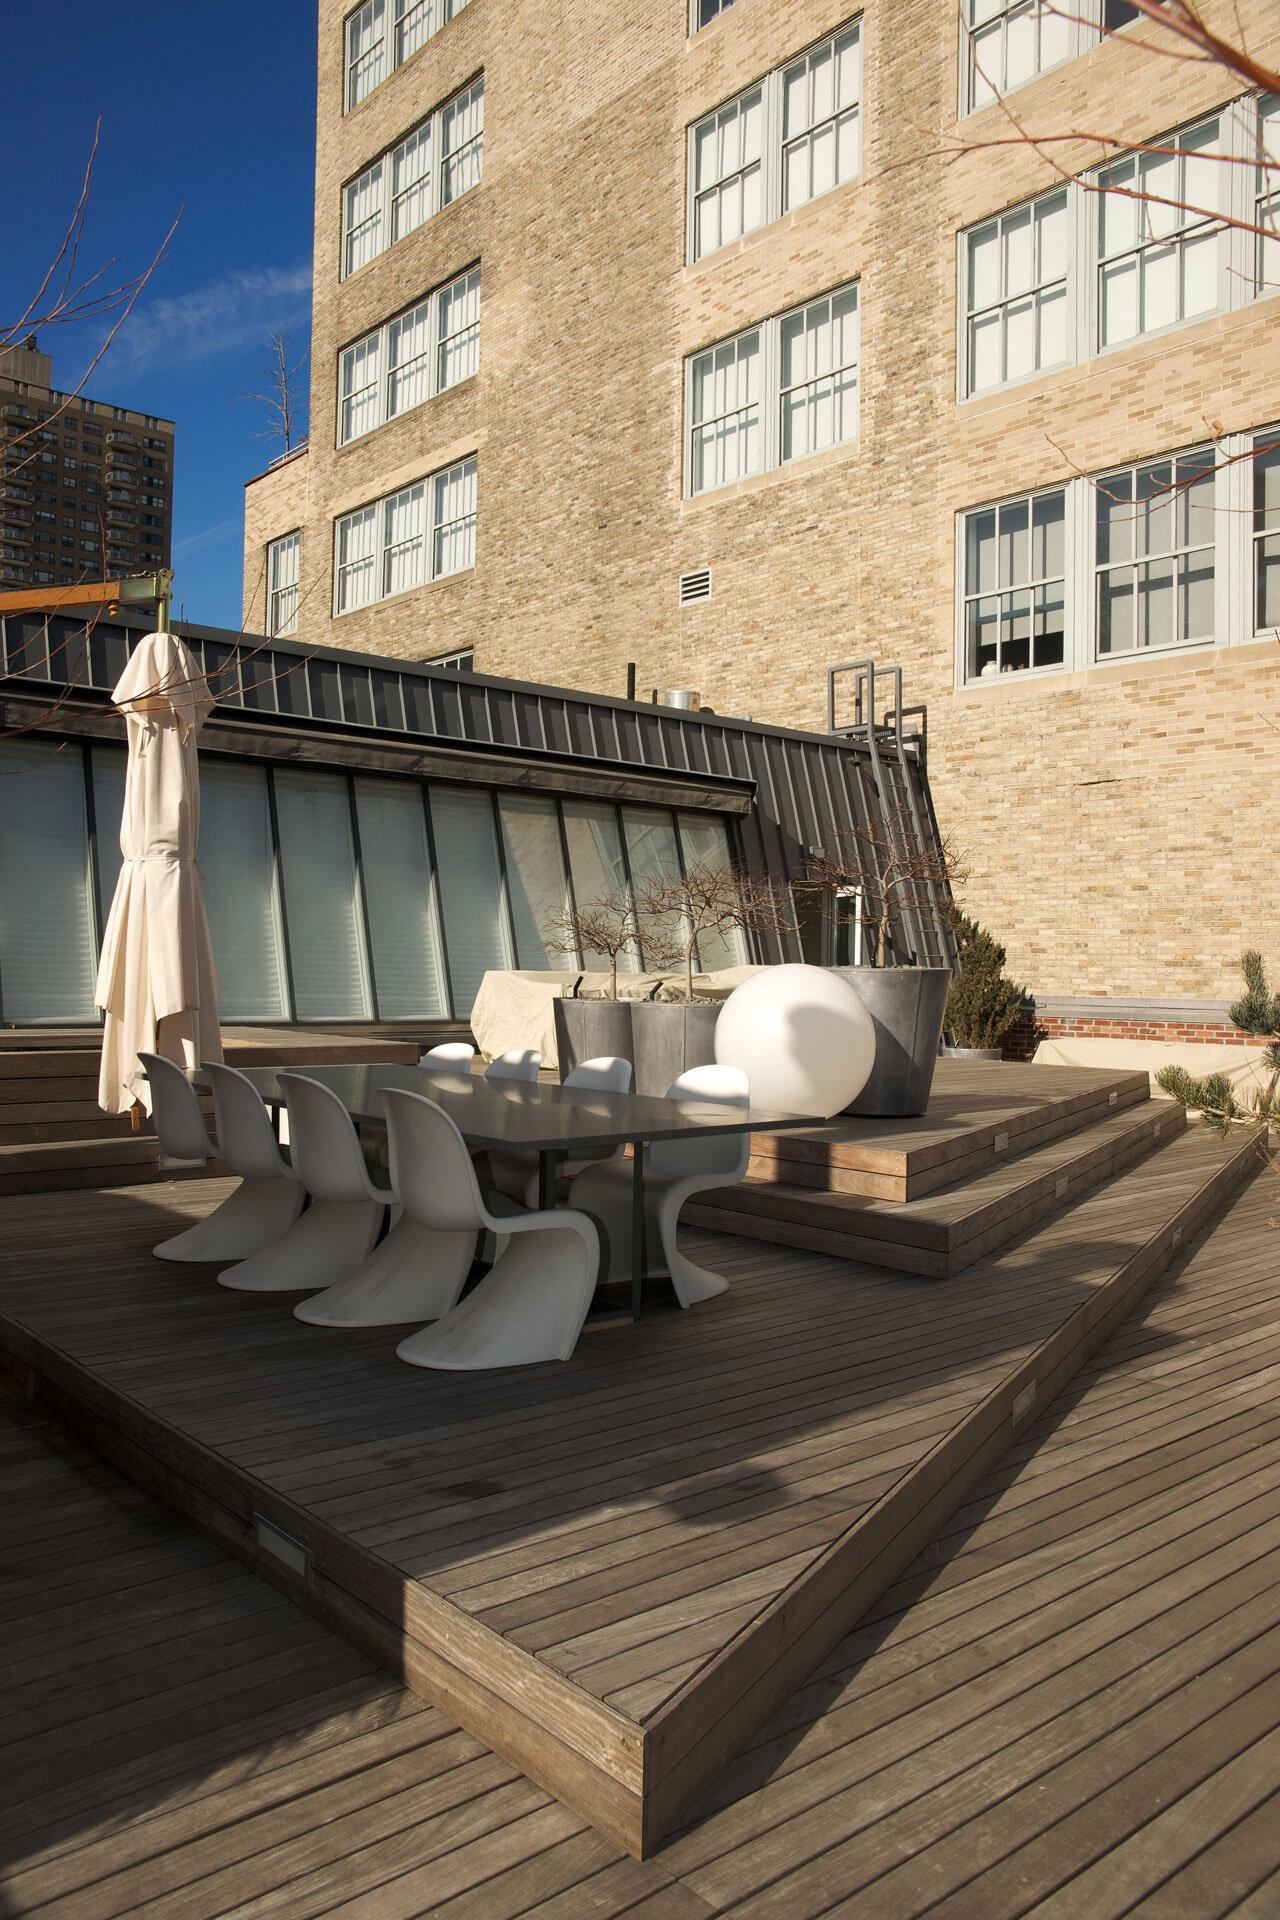 Duplex-penthouse, Cooper Square CWS Architecture (9)